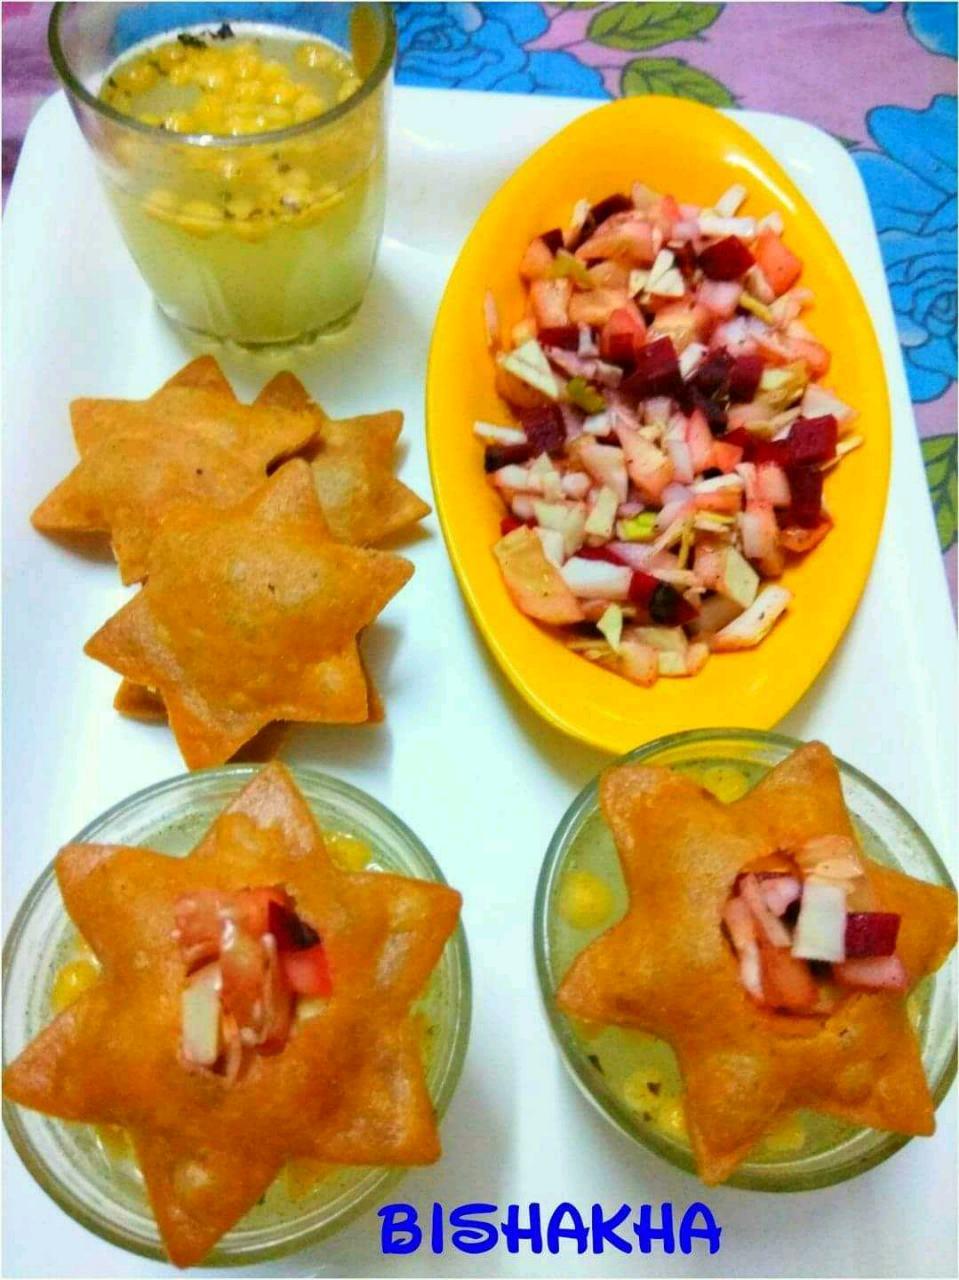 #Salsa_stuffed #Peach_Panna #Oats_Panipuri